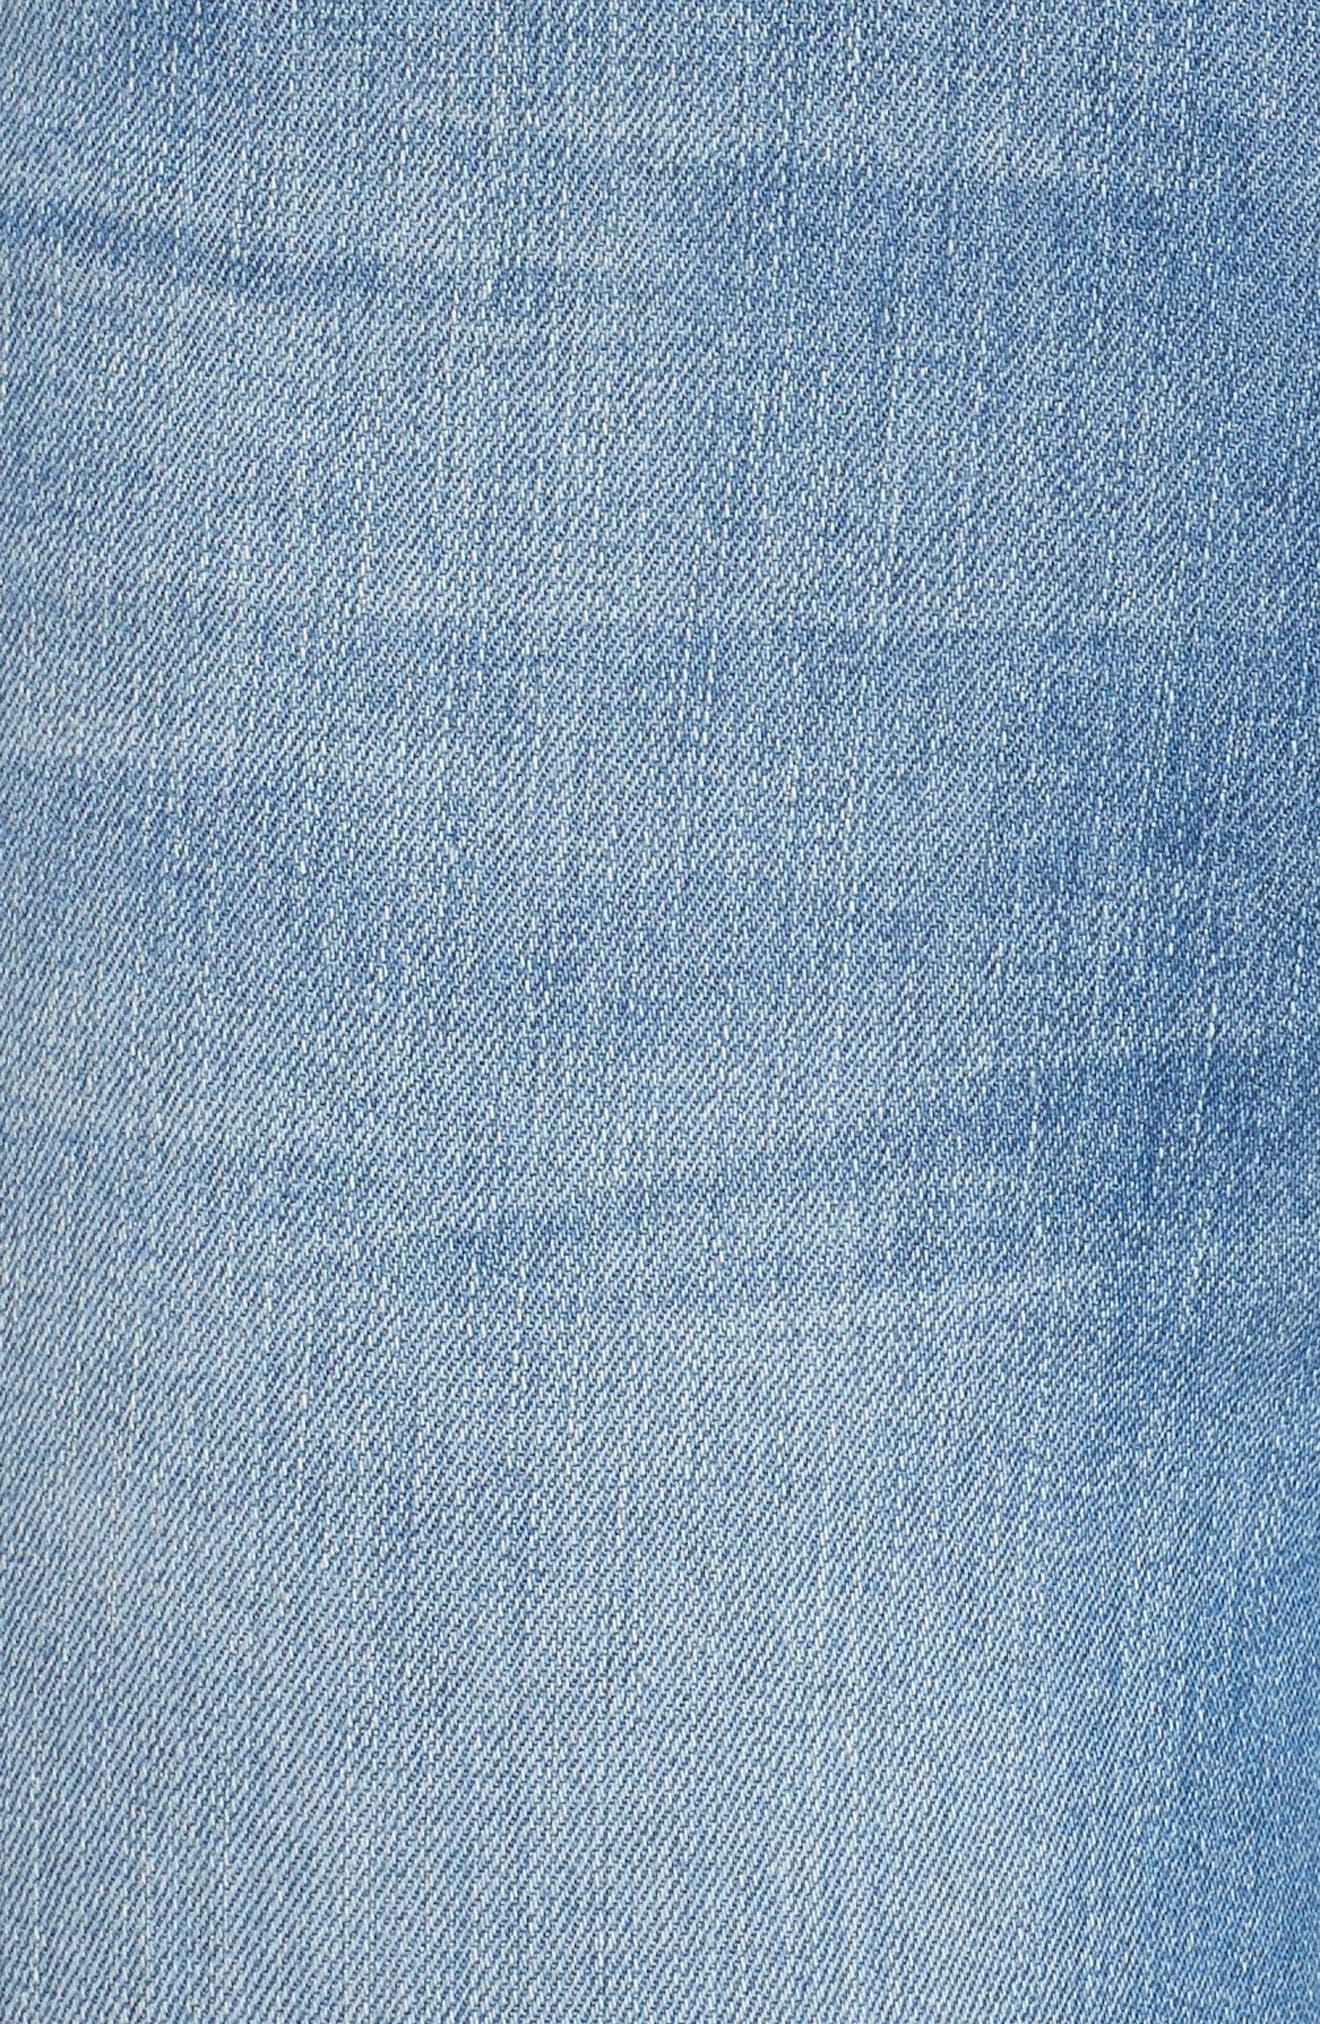 Good Waist Tunnel Hem Skinny Jeans,                             Alternate thumbnail 6, color,                             402